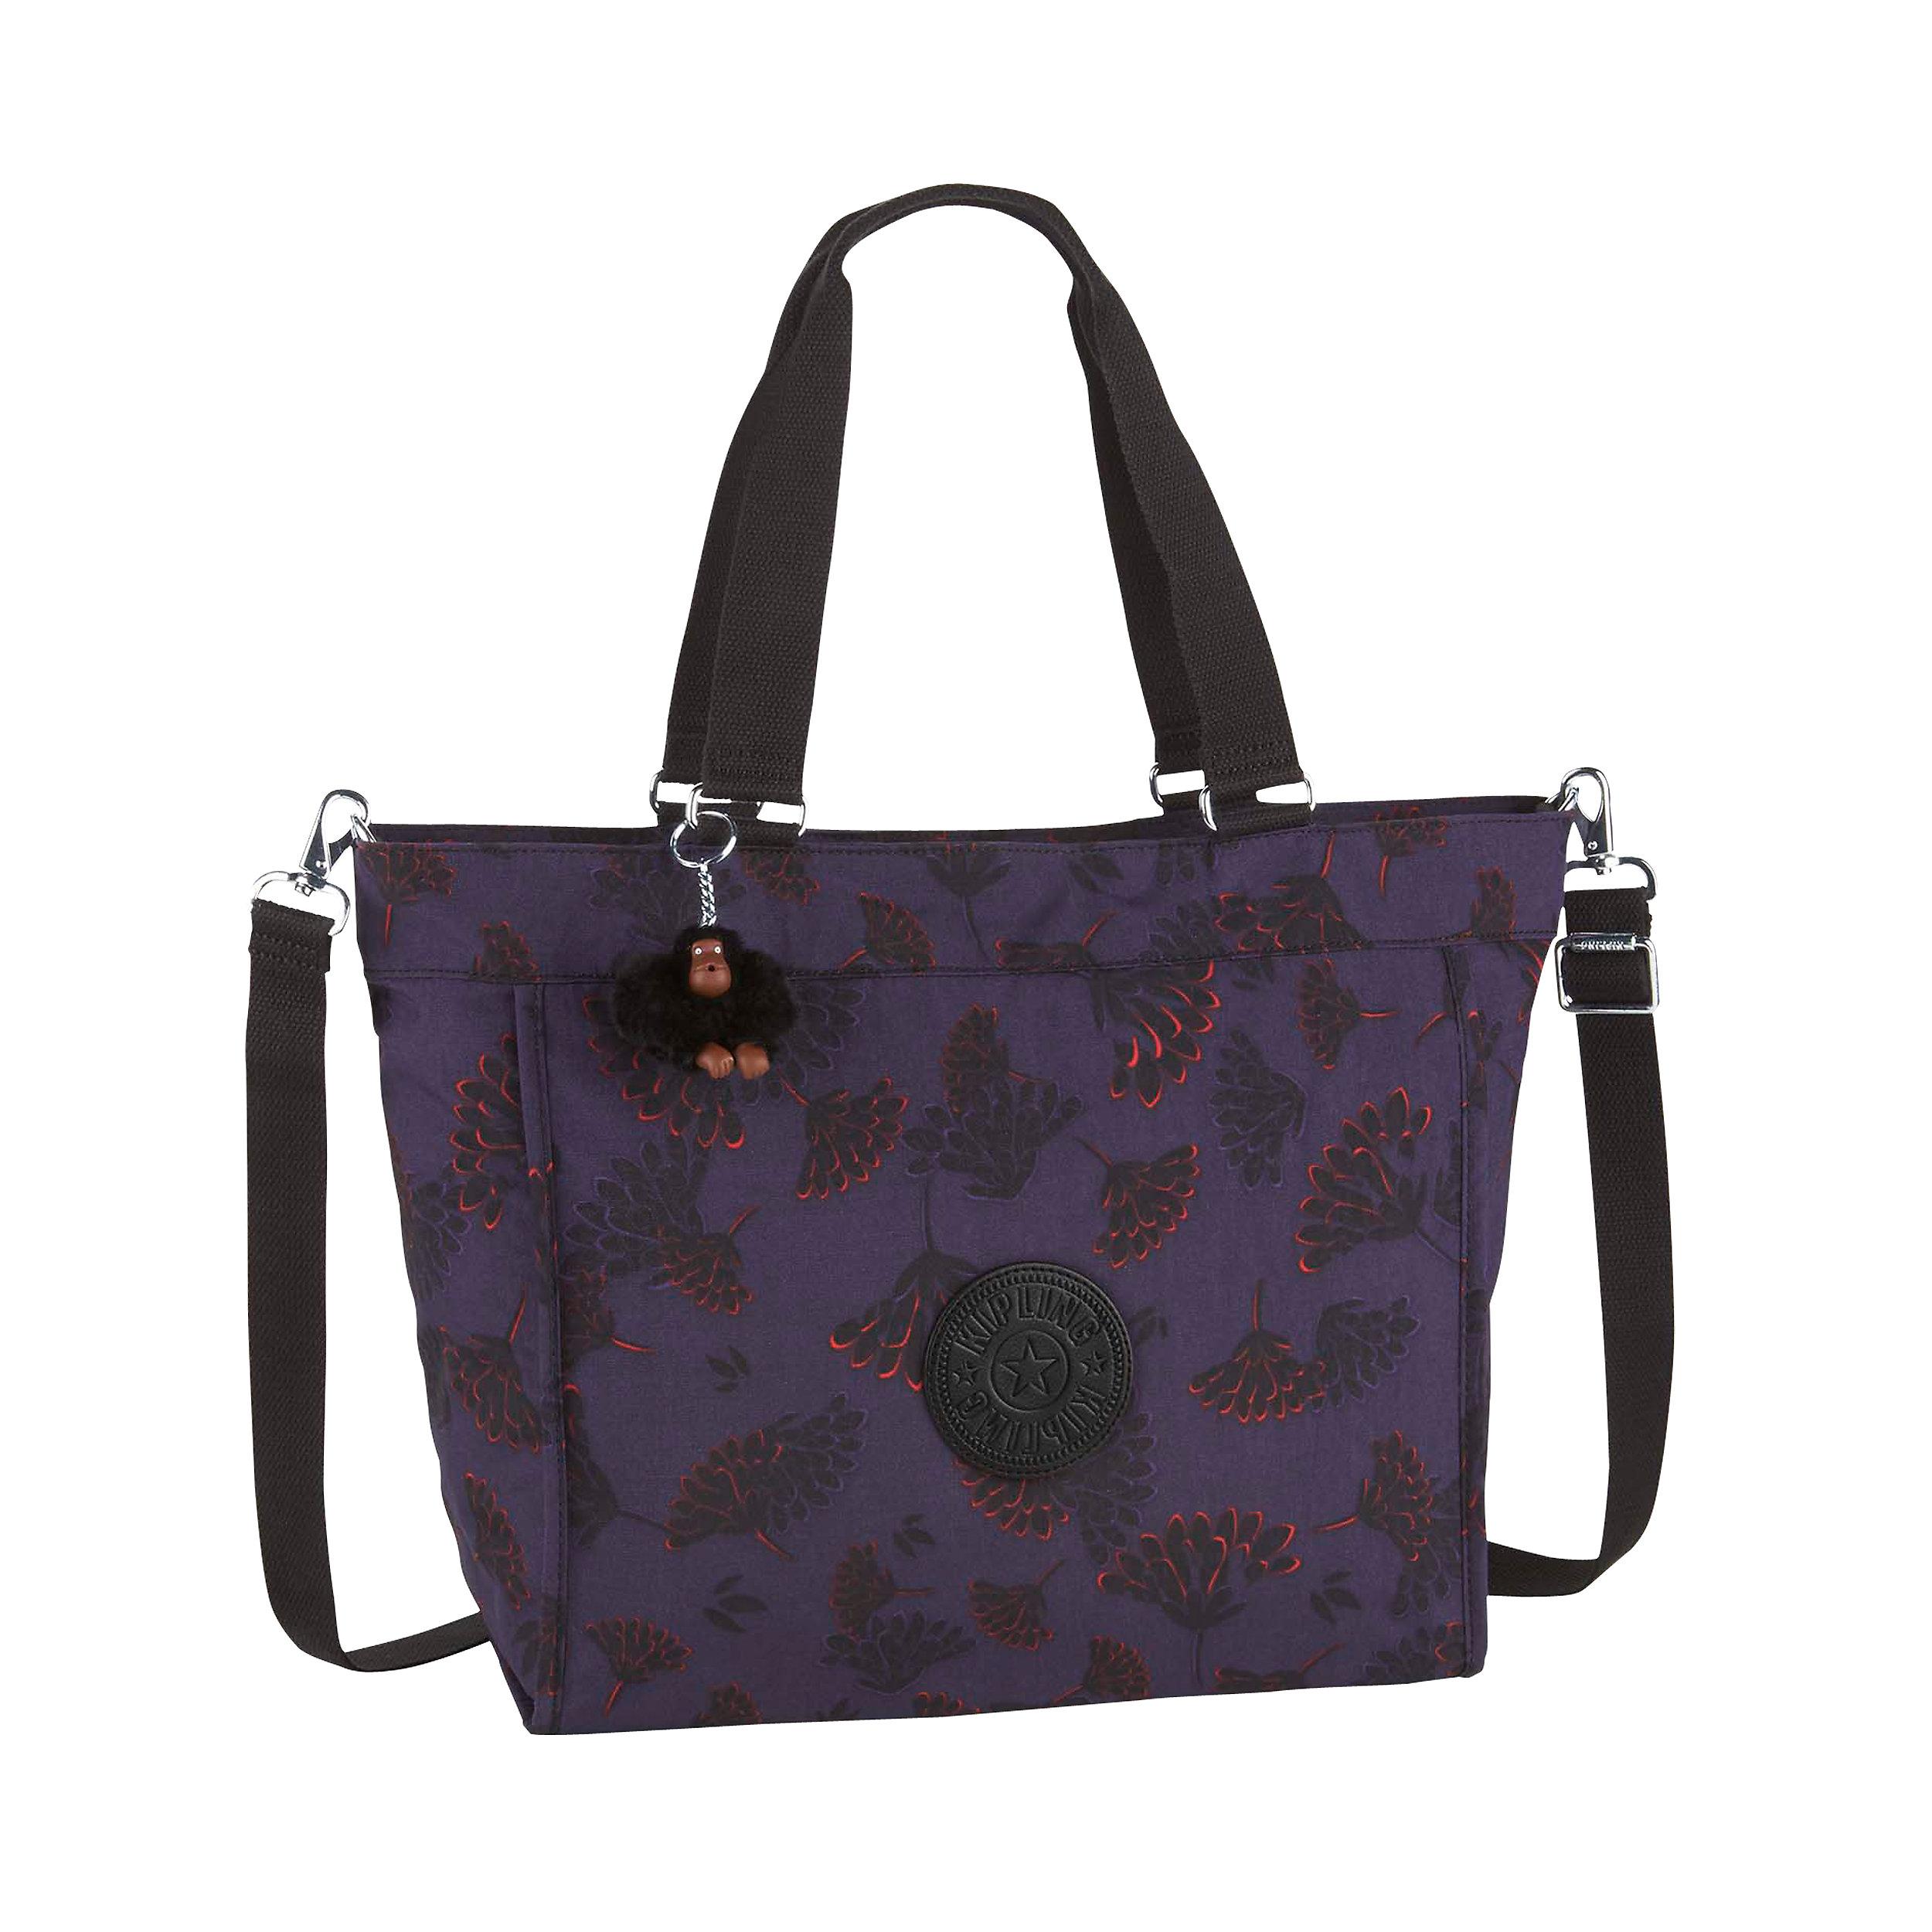 Crossbody Bag New Shopper L Tote Festival 18 Liter